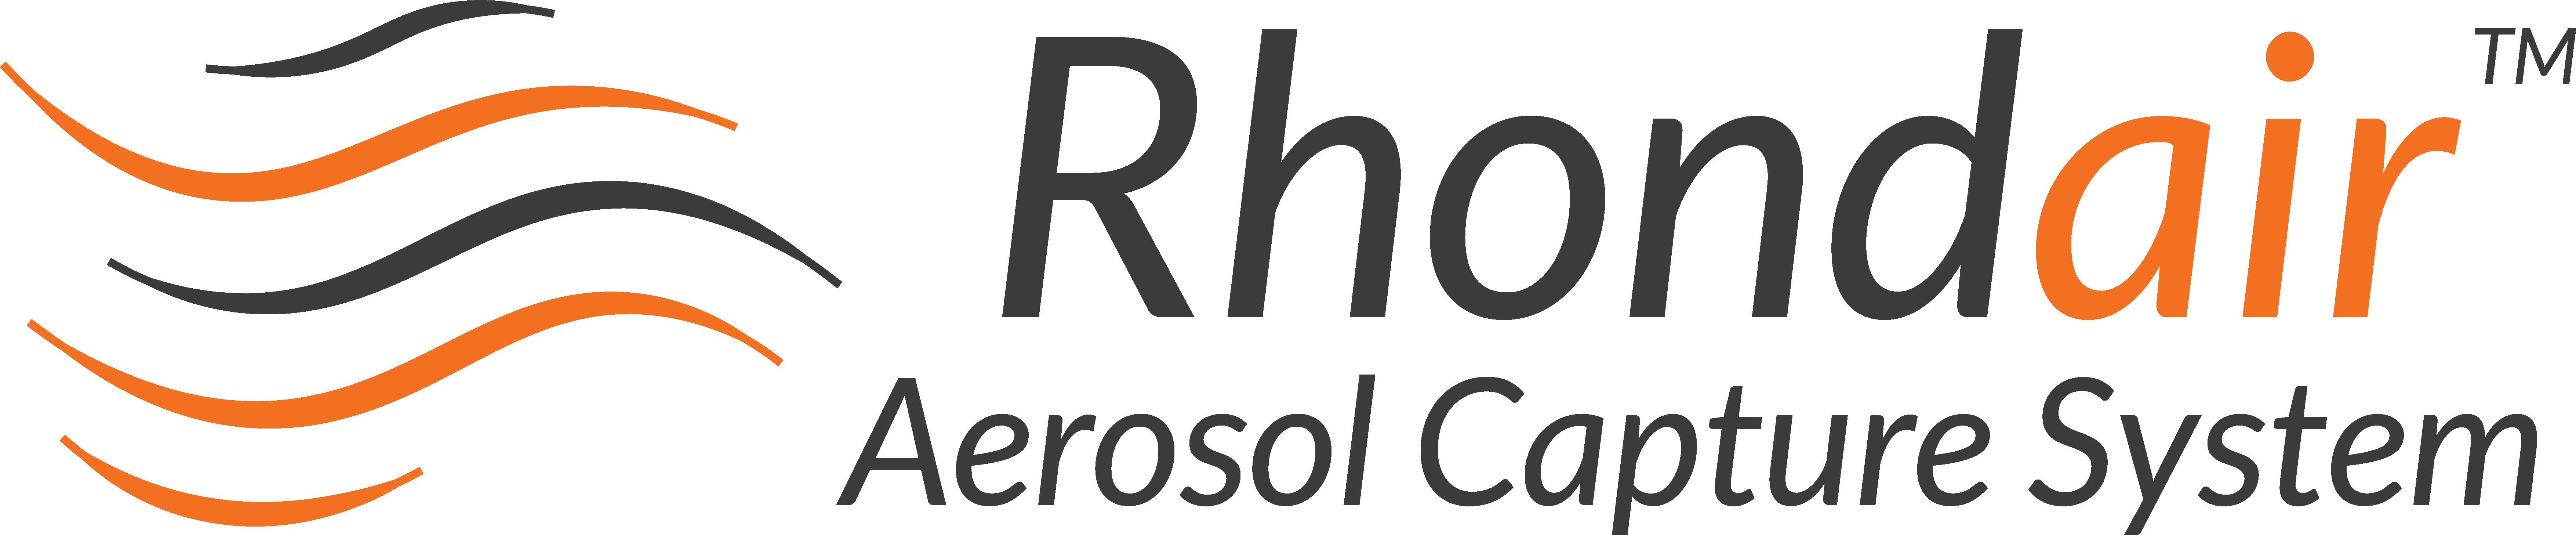 Rhondair Logo Outlines